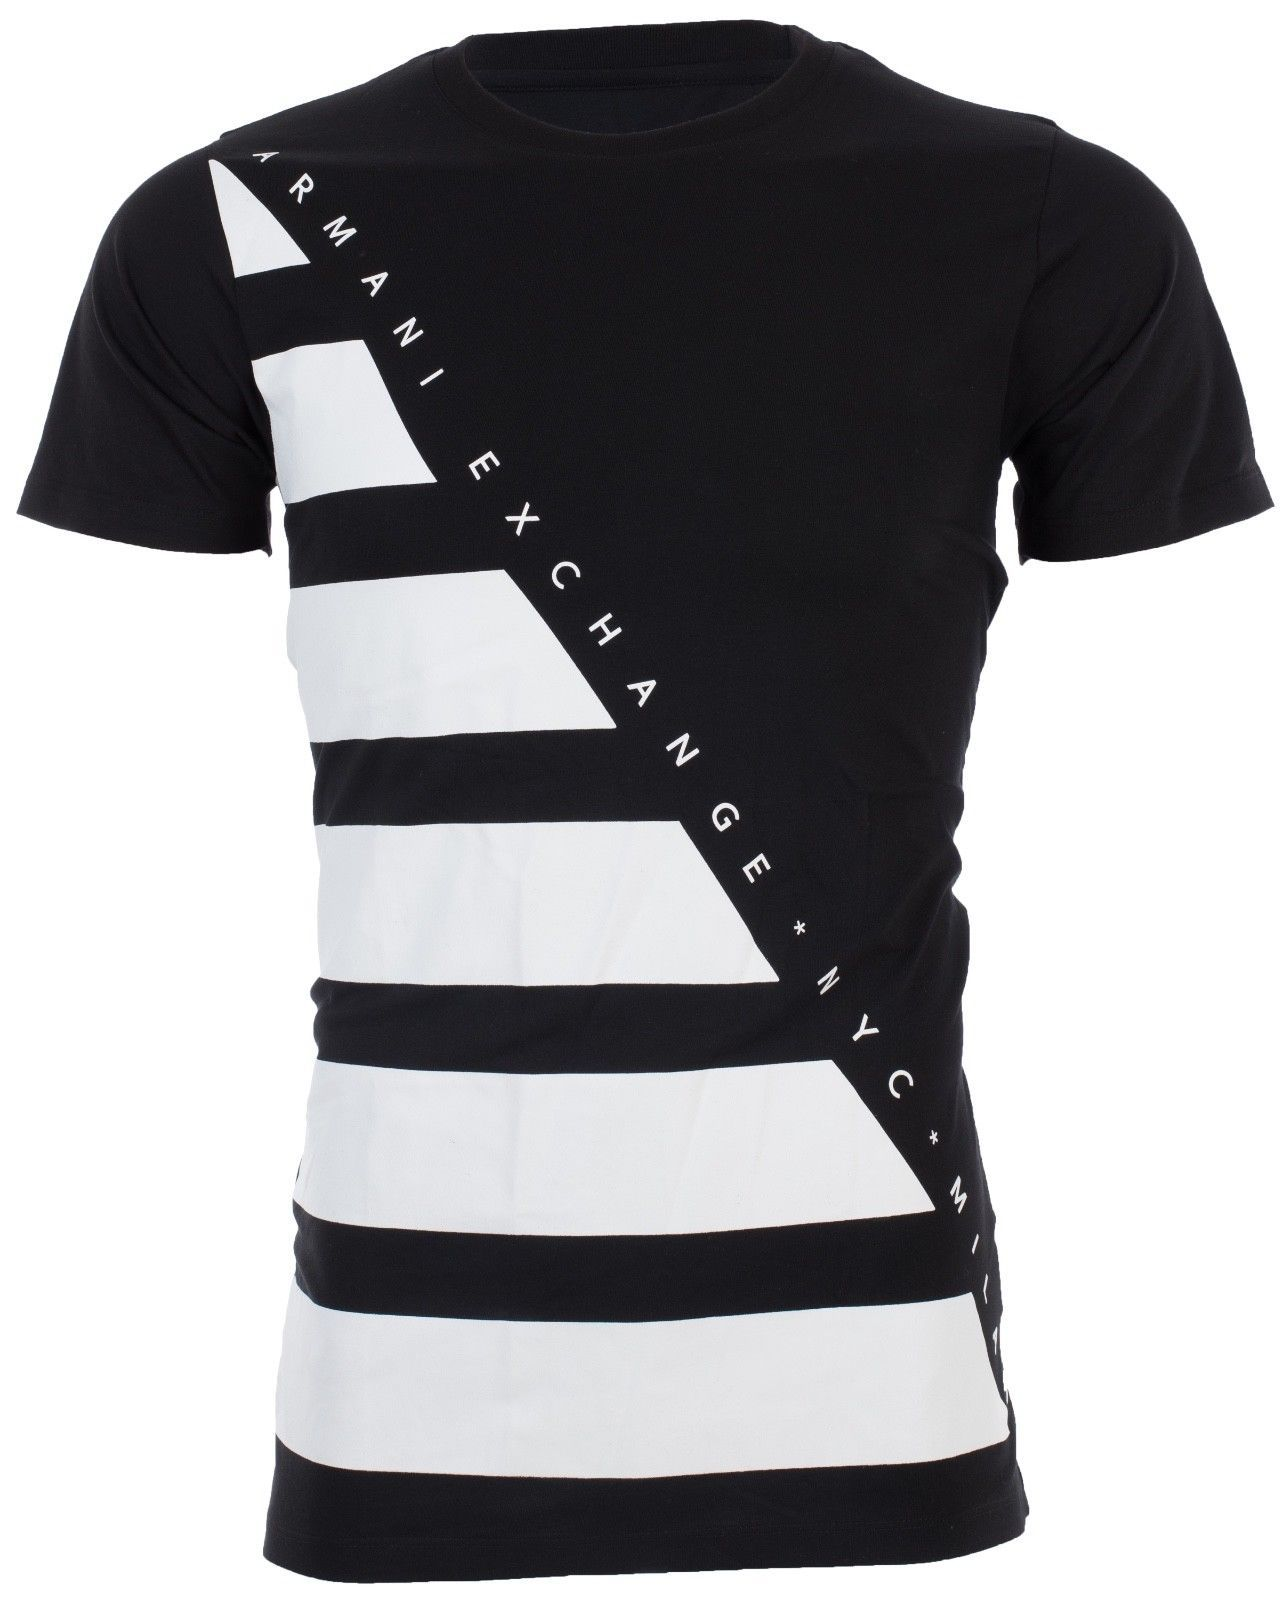 48389556fb0226 Armani Exchange Men T-Shirt Diagonal Stripe Premium Black White Designer  $45 Nwt